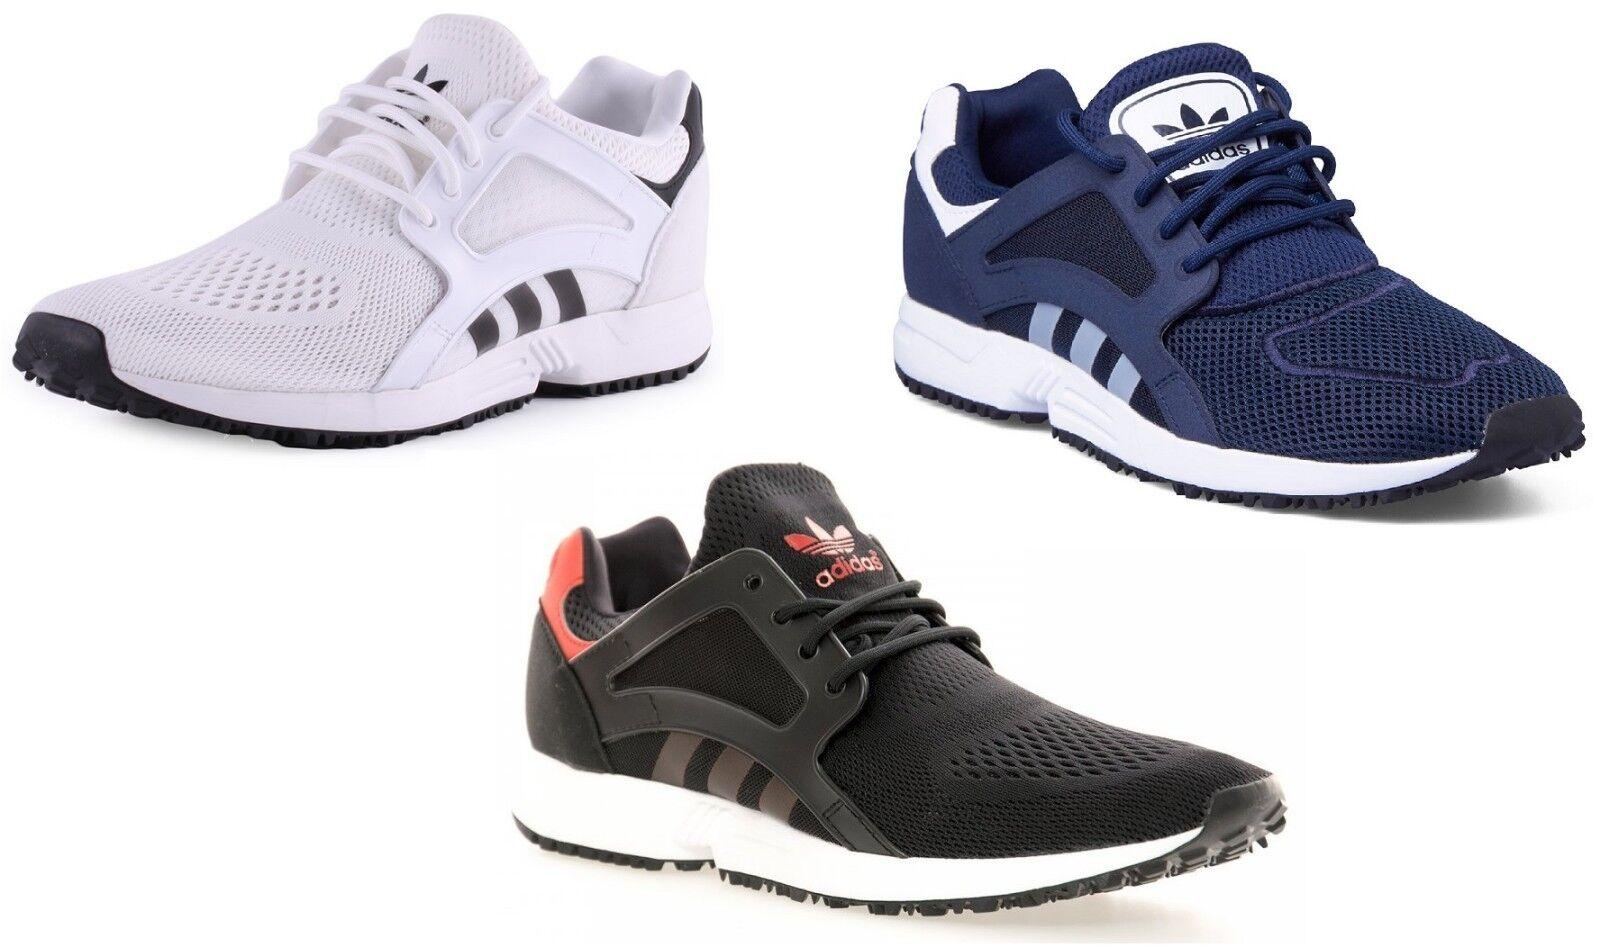 zapatos ADIDAS ORIGINALS RACER LITE EM RUNNING CUSHION  B35806 M19699 B35808